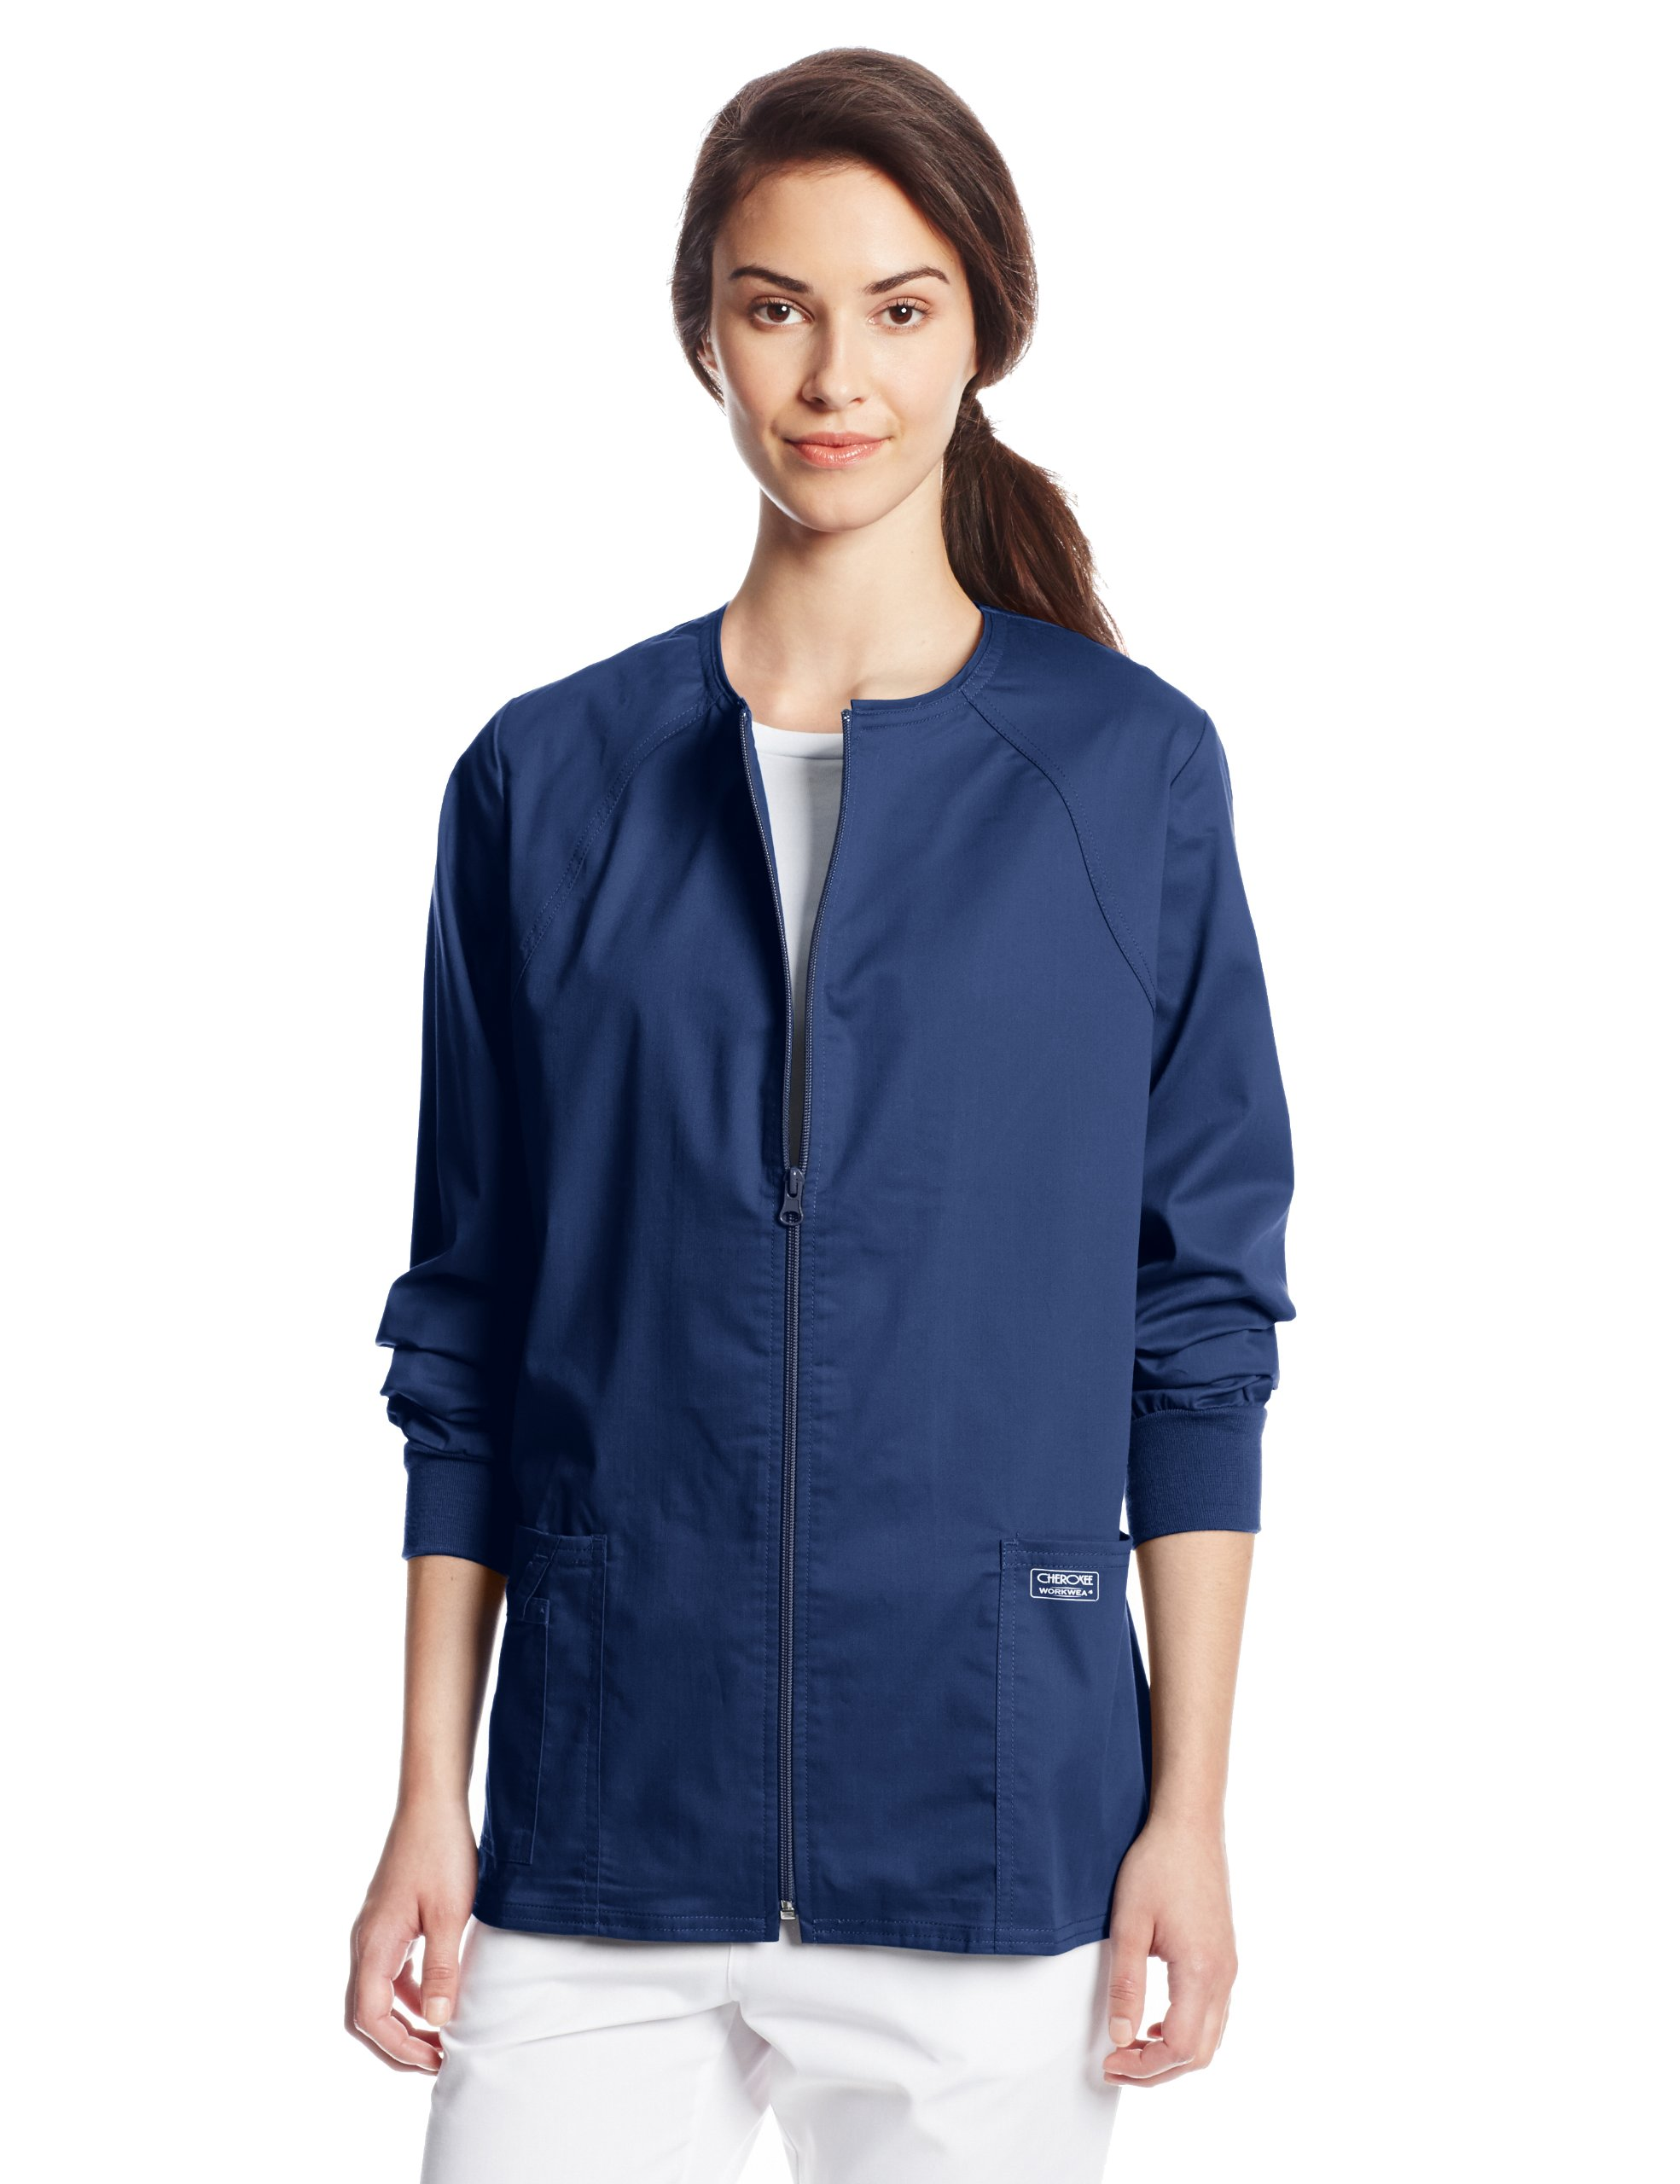 Cherokee Women's Workwear Scrubs Core Stretch Zip Front Warm Up Jacket, Navy, 2X-Small